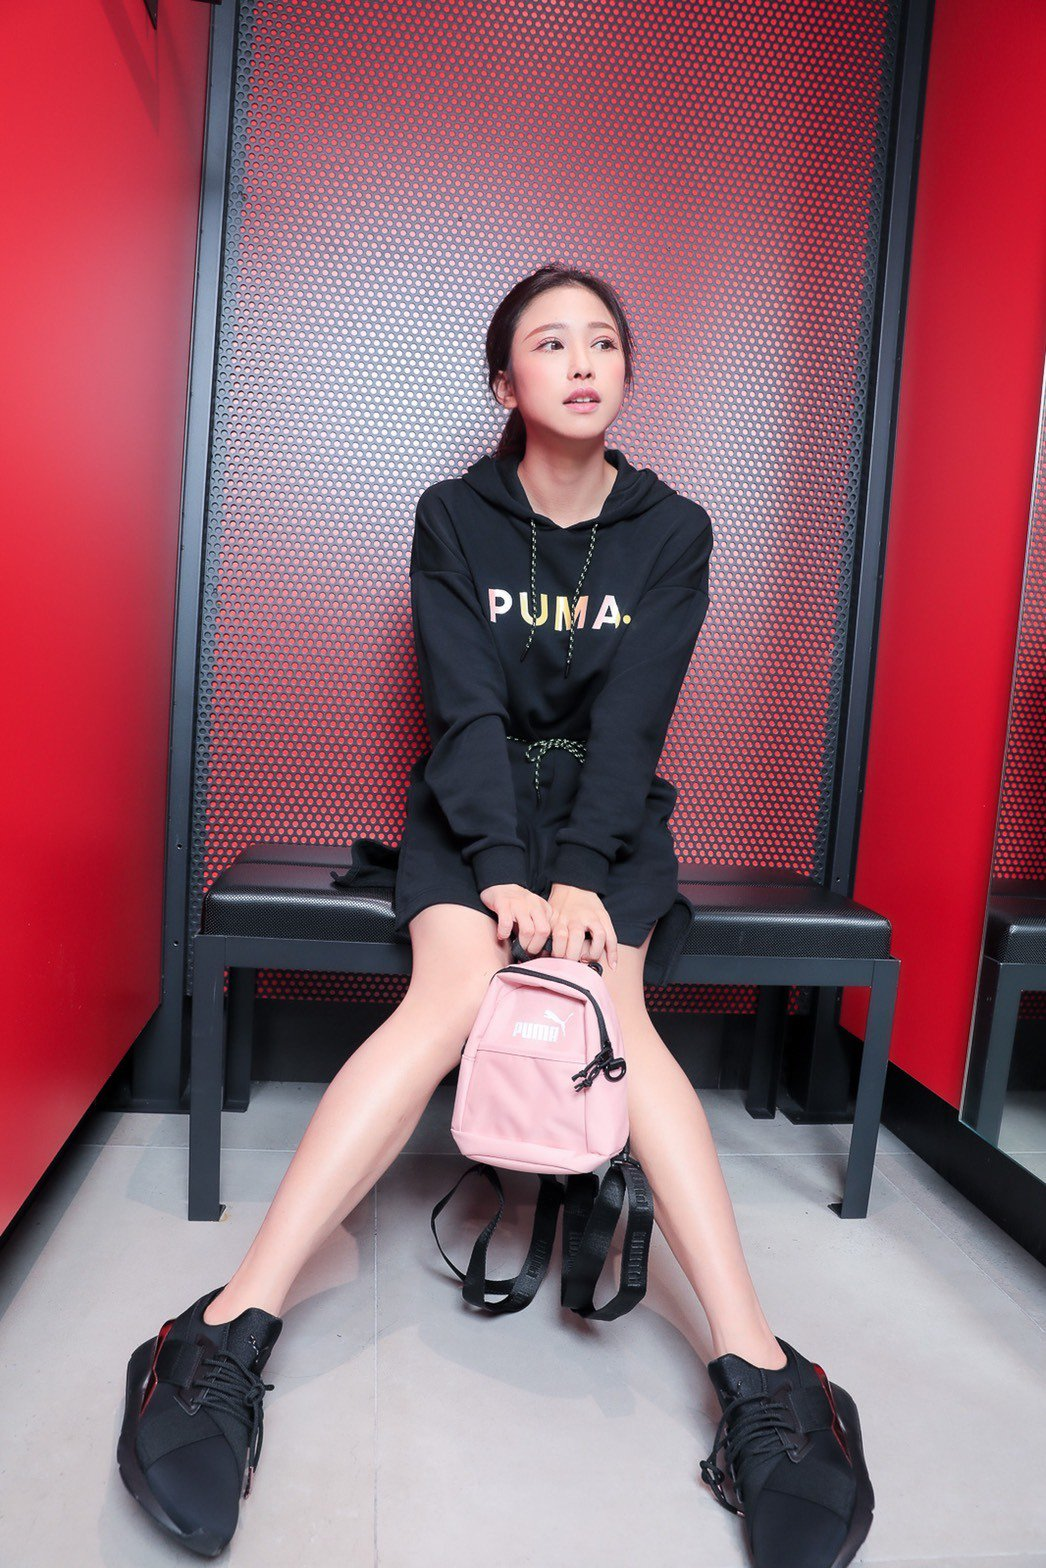 7-ELEVEN推出限量PUMA潮流後背包,集滿6點加699元可兌換一款,約市價...